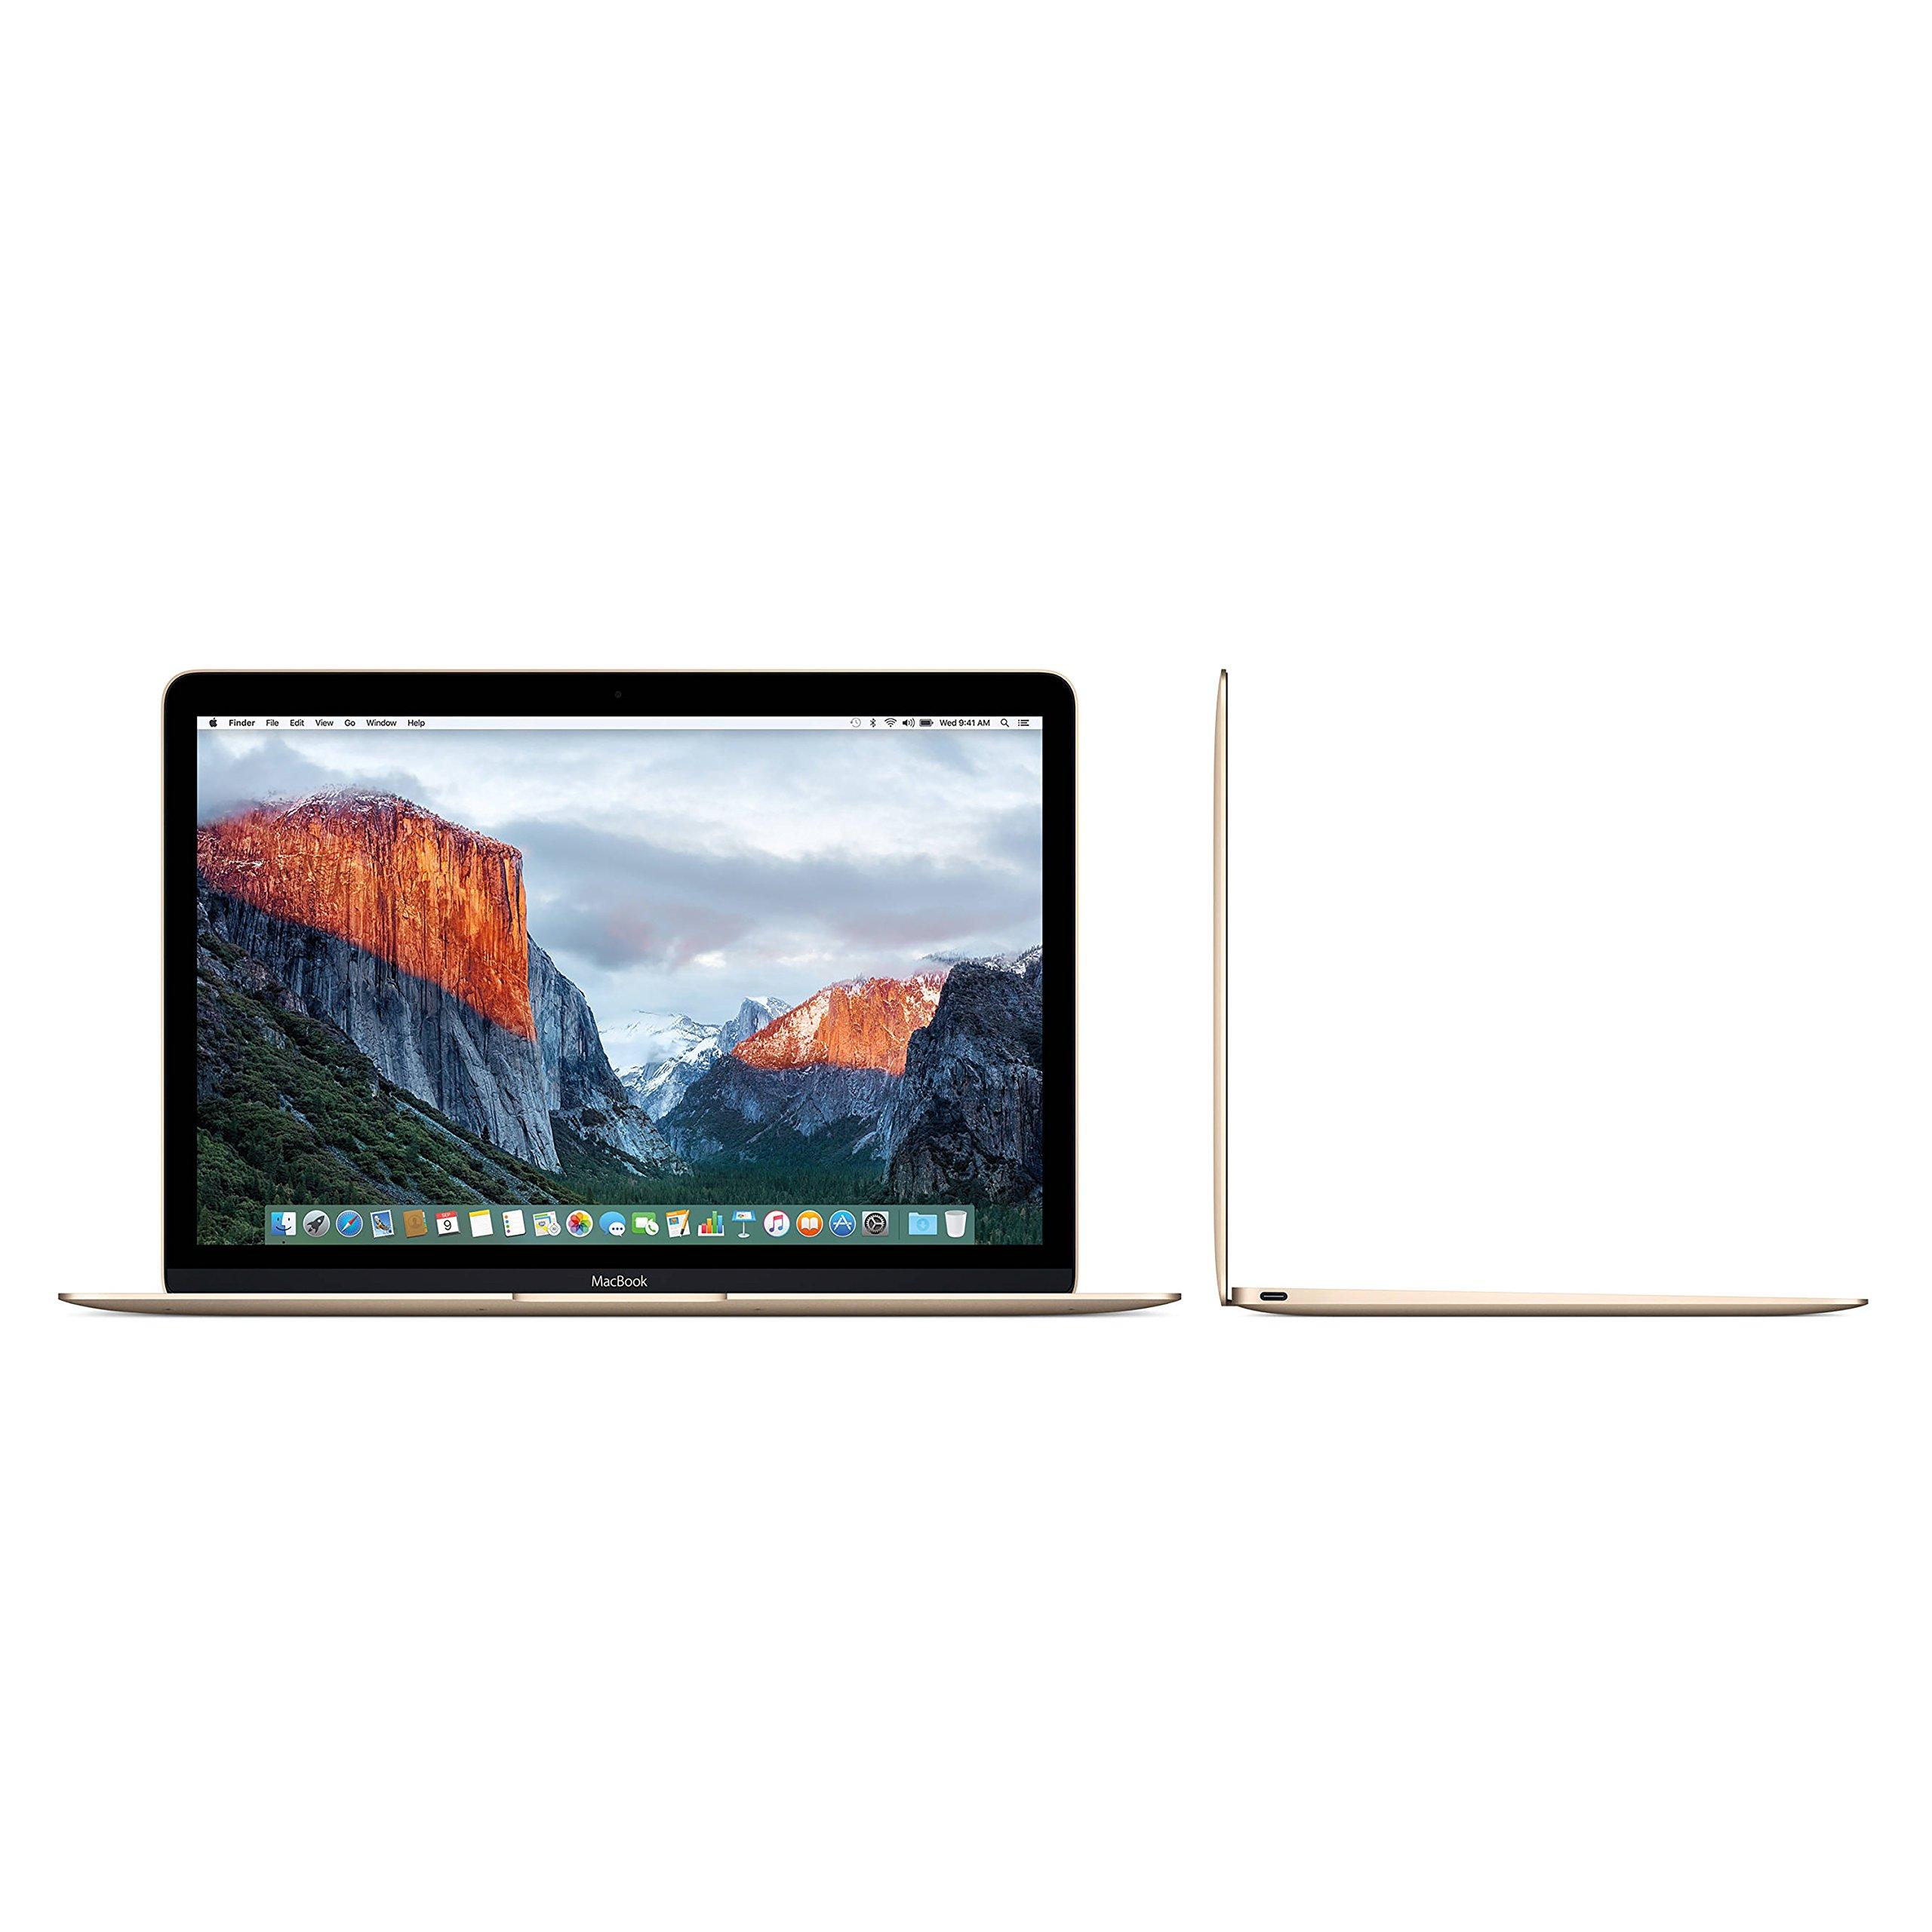 "Apple Gold Macbook - MK4N2LL/A Core M-5Y51 1.2GHz (up to 2.6GHz), 8GB RAM,512GB SSD, 12"" Retina IPS, Laptop (Renewed)"